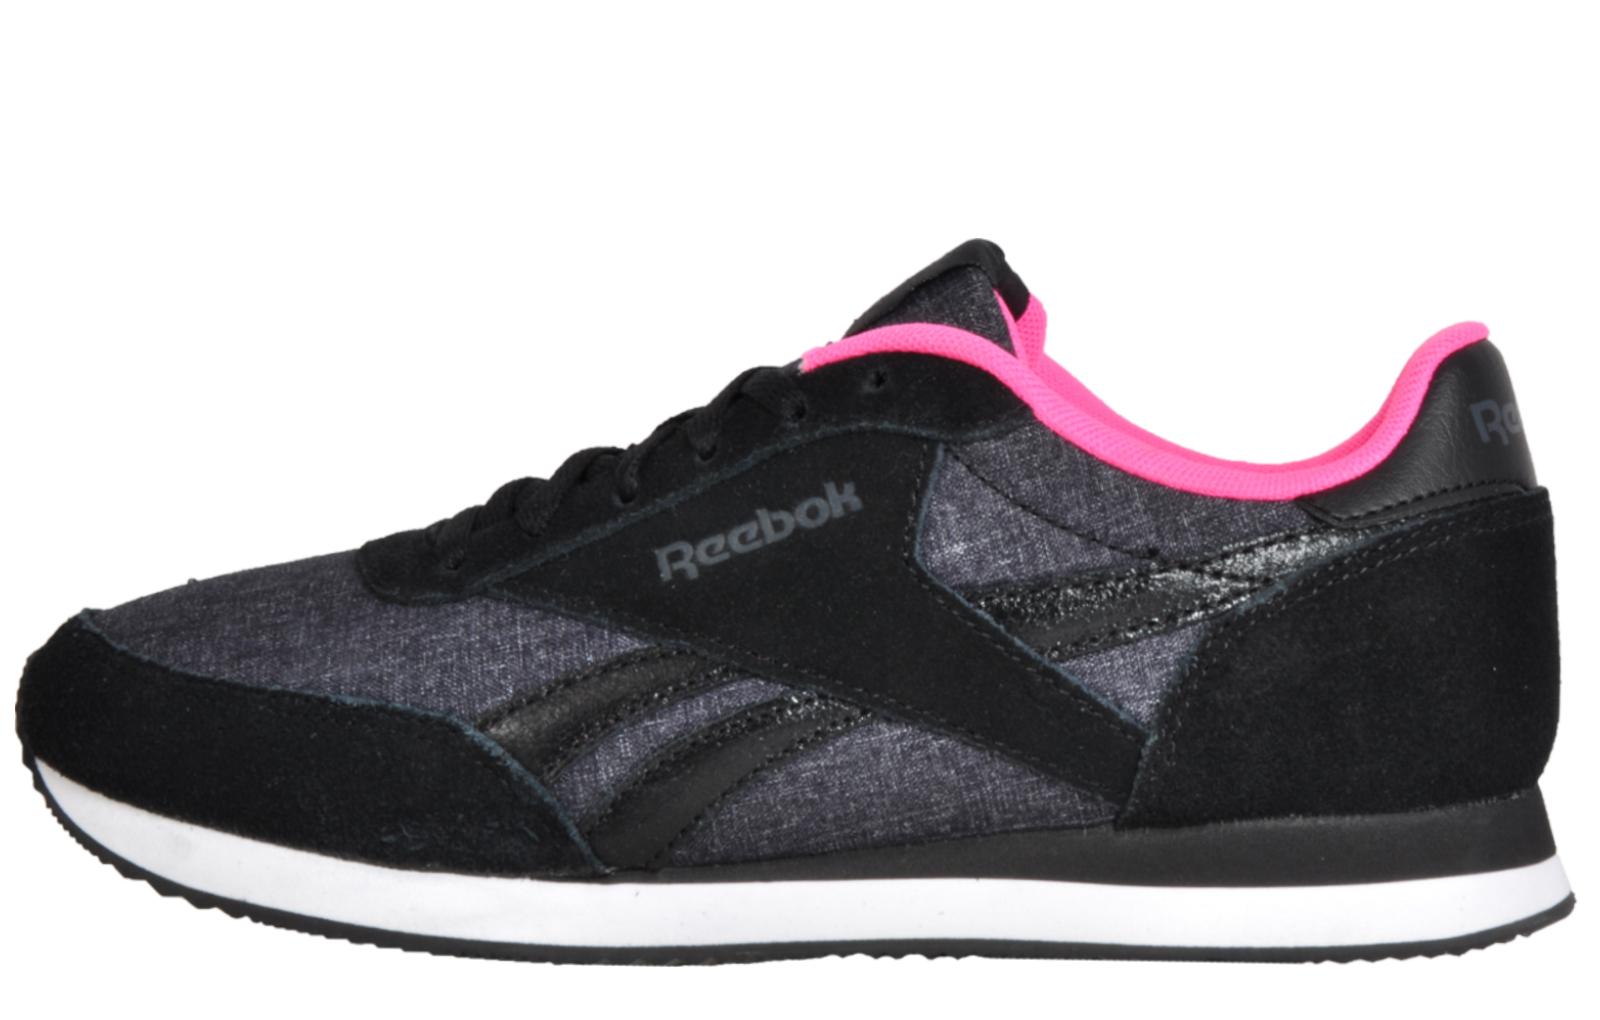 Reebok Royal Classic Jog 2LX Women s Girls Casual Retro Fashion Trainers  Black 952708926